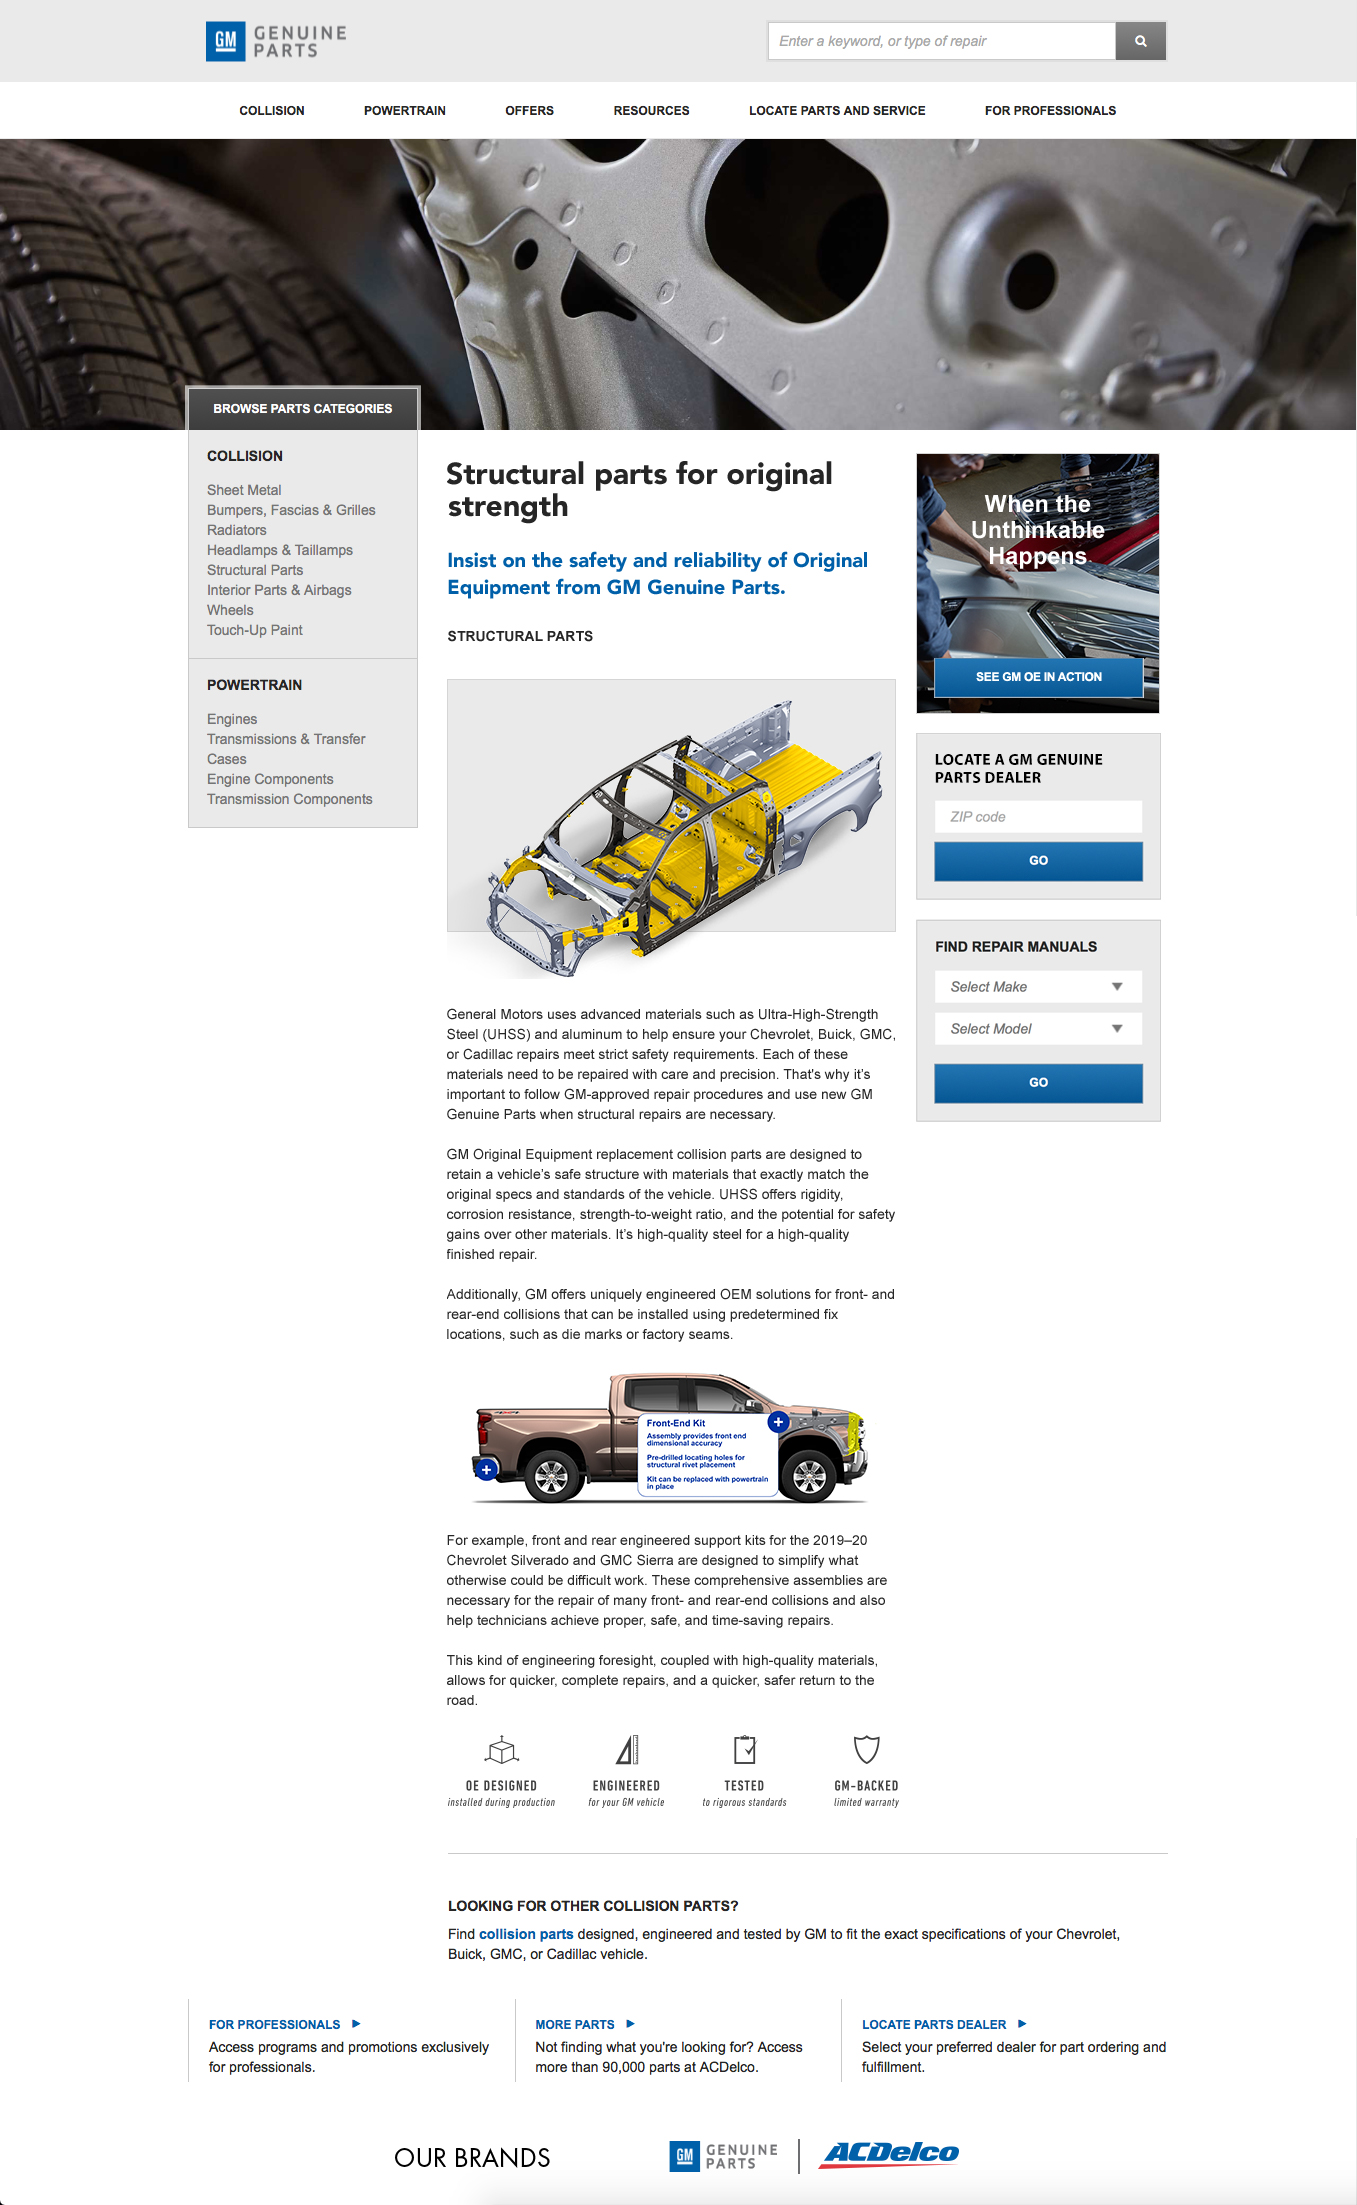 gmgp-19-consumer-collision-site-VehicleRepairability_FULL PAGE.jpg